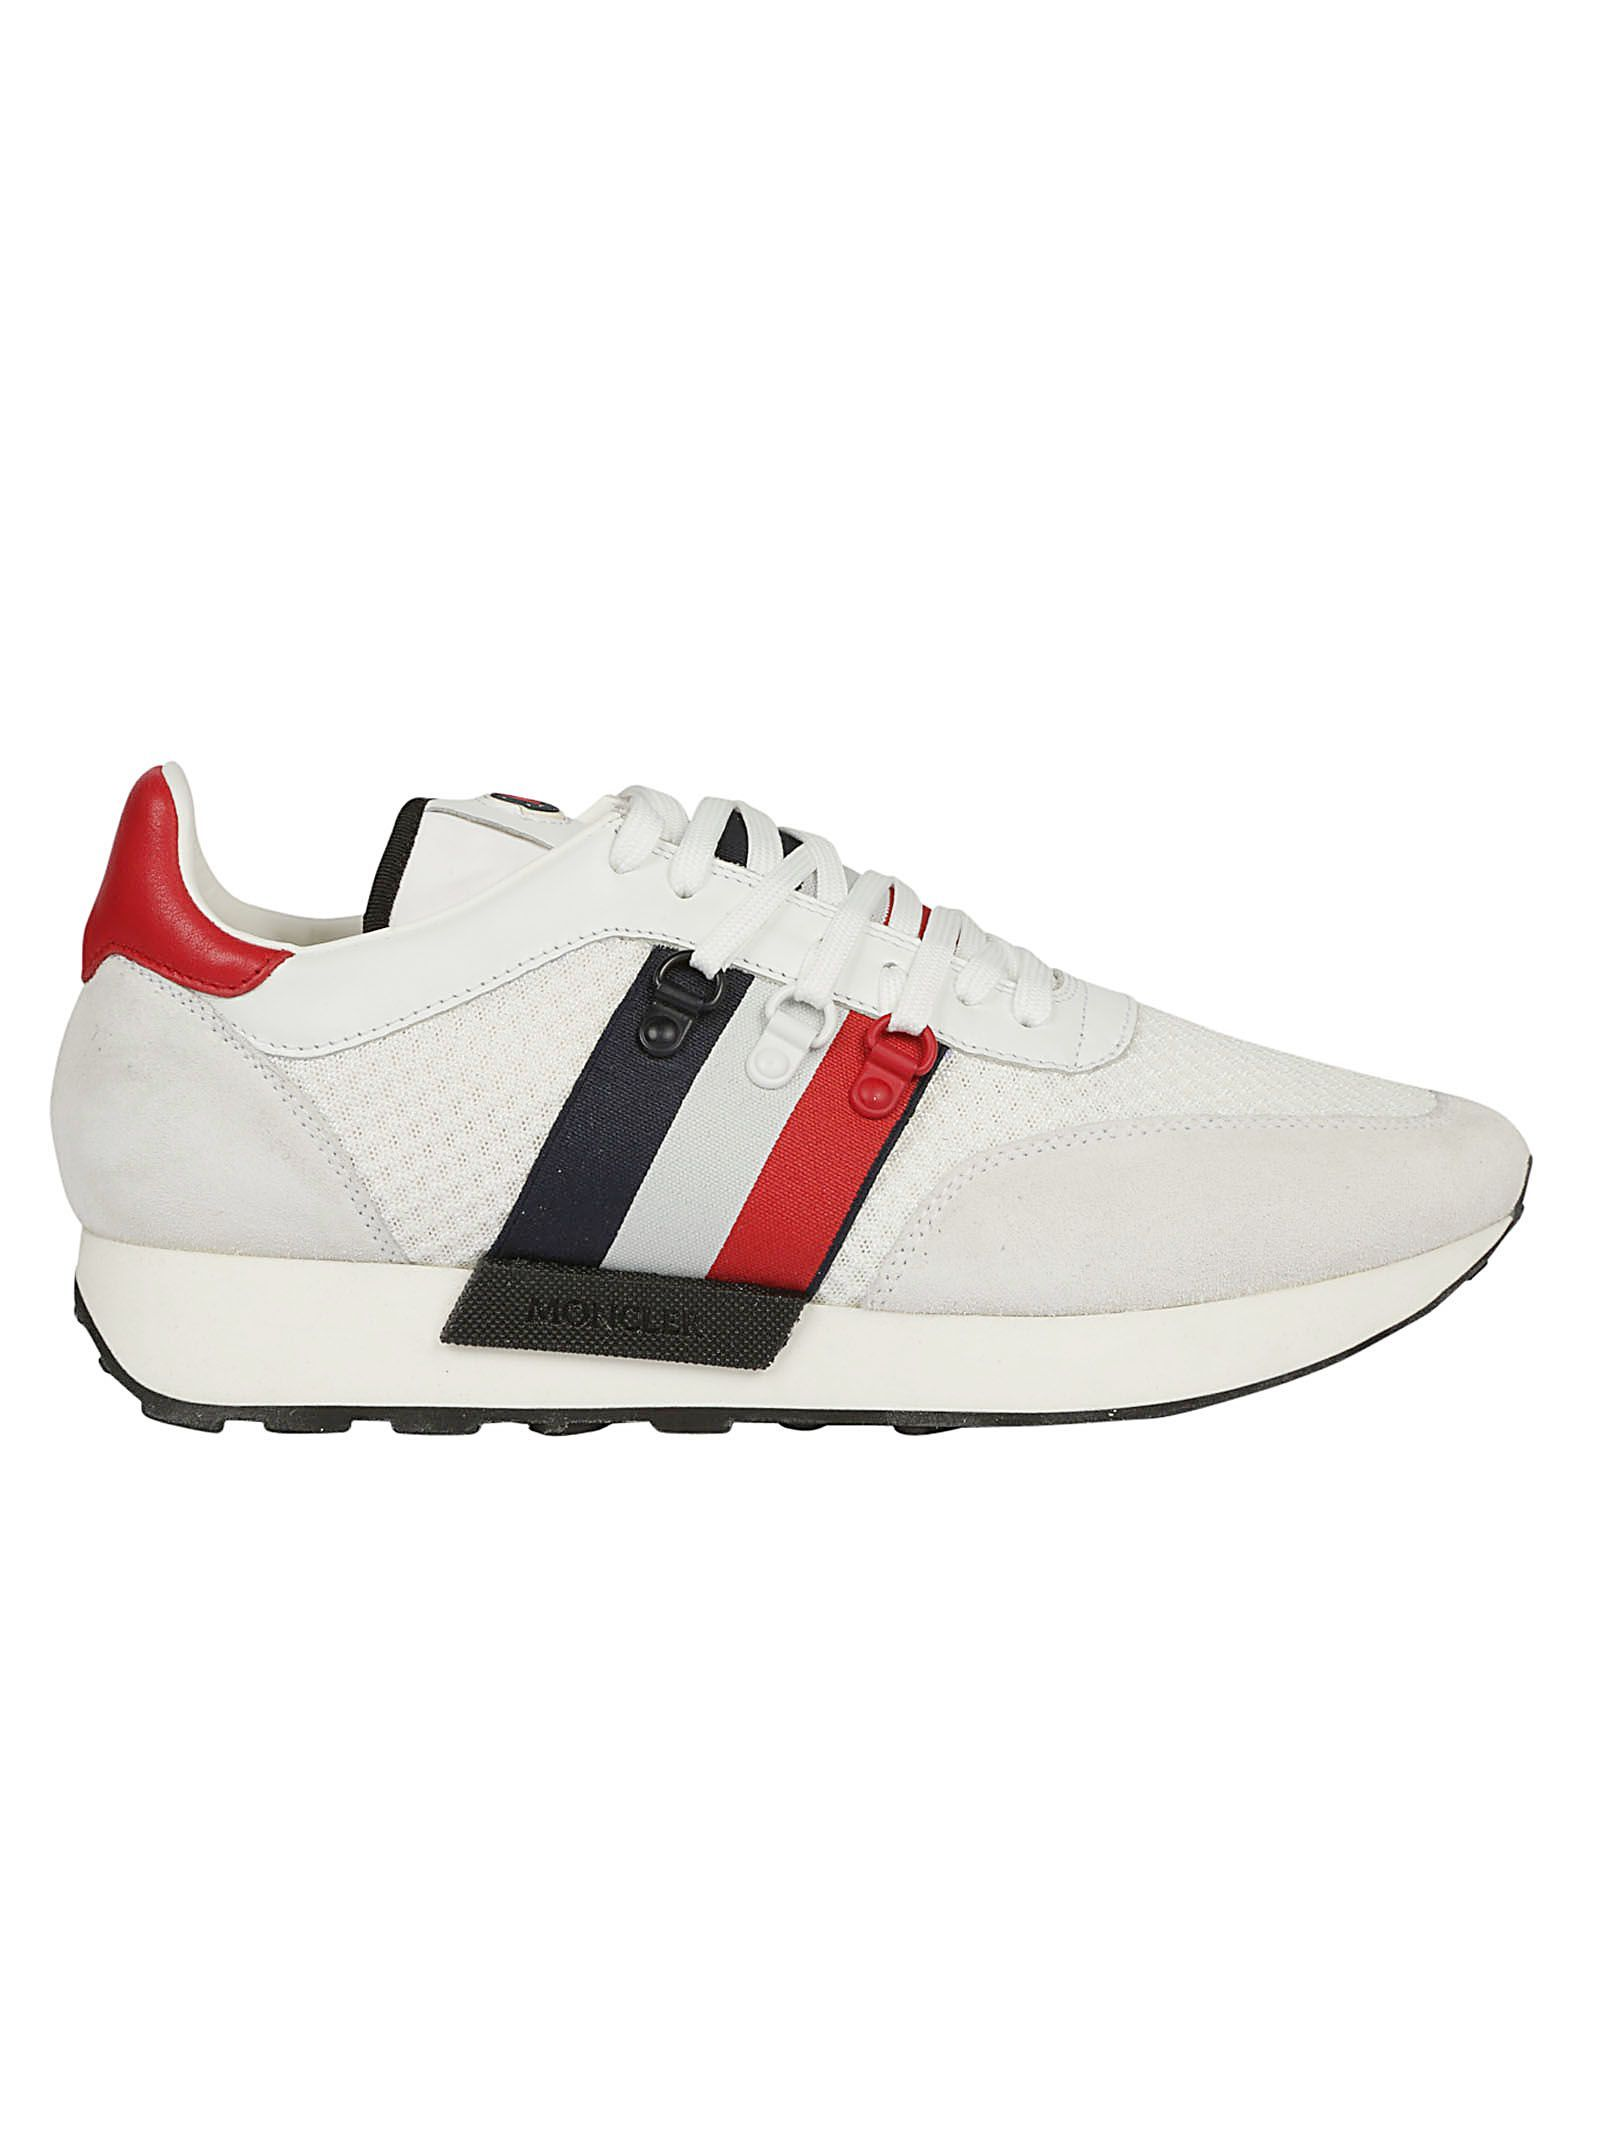 89f049c4f MONCLER NEW HORACE SNEAKERS. #moncler #shoes #   Moncler   Moncler ...